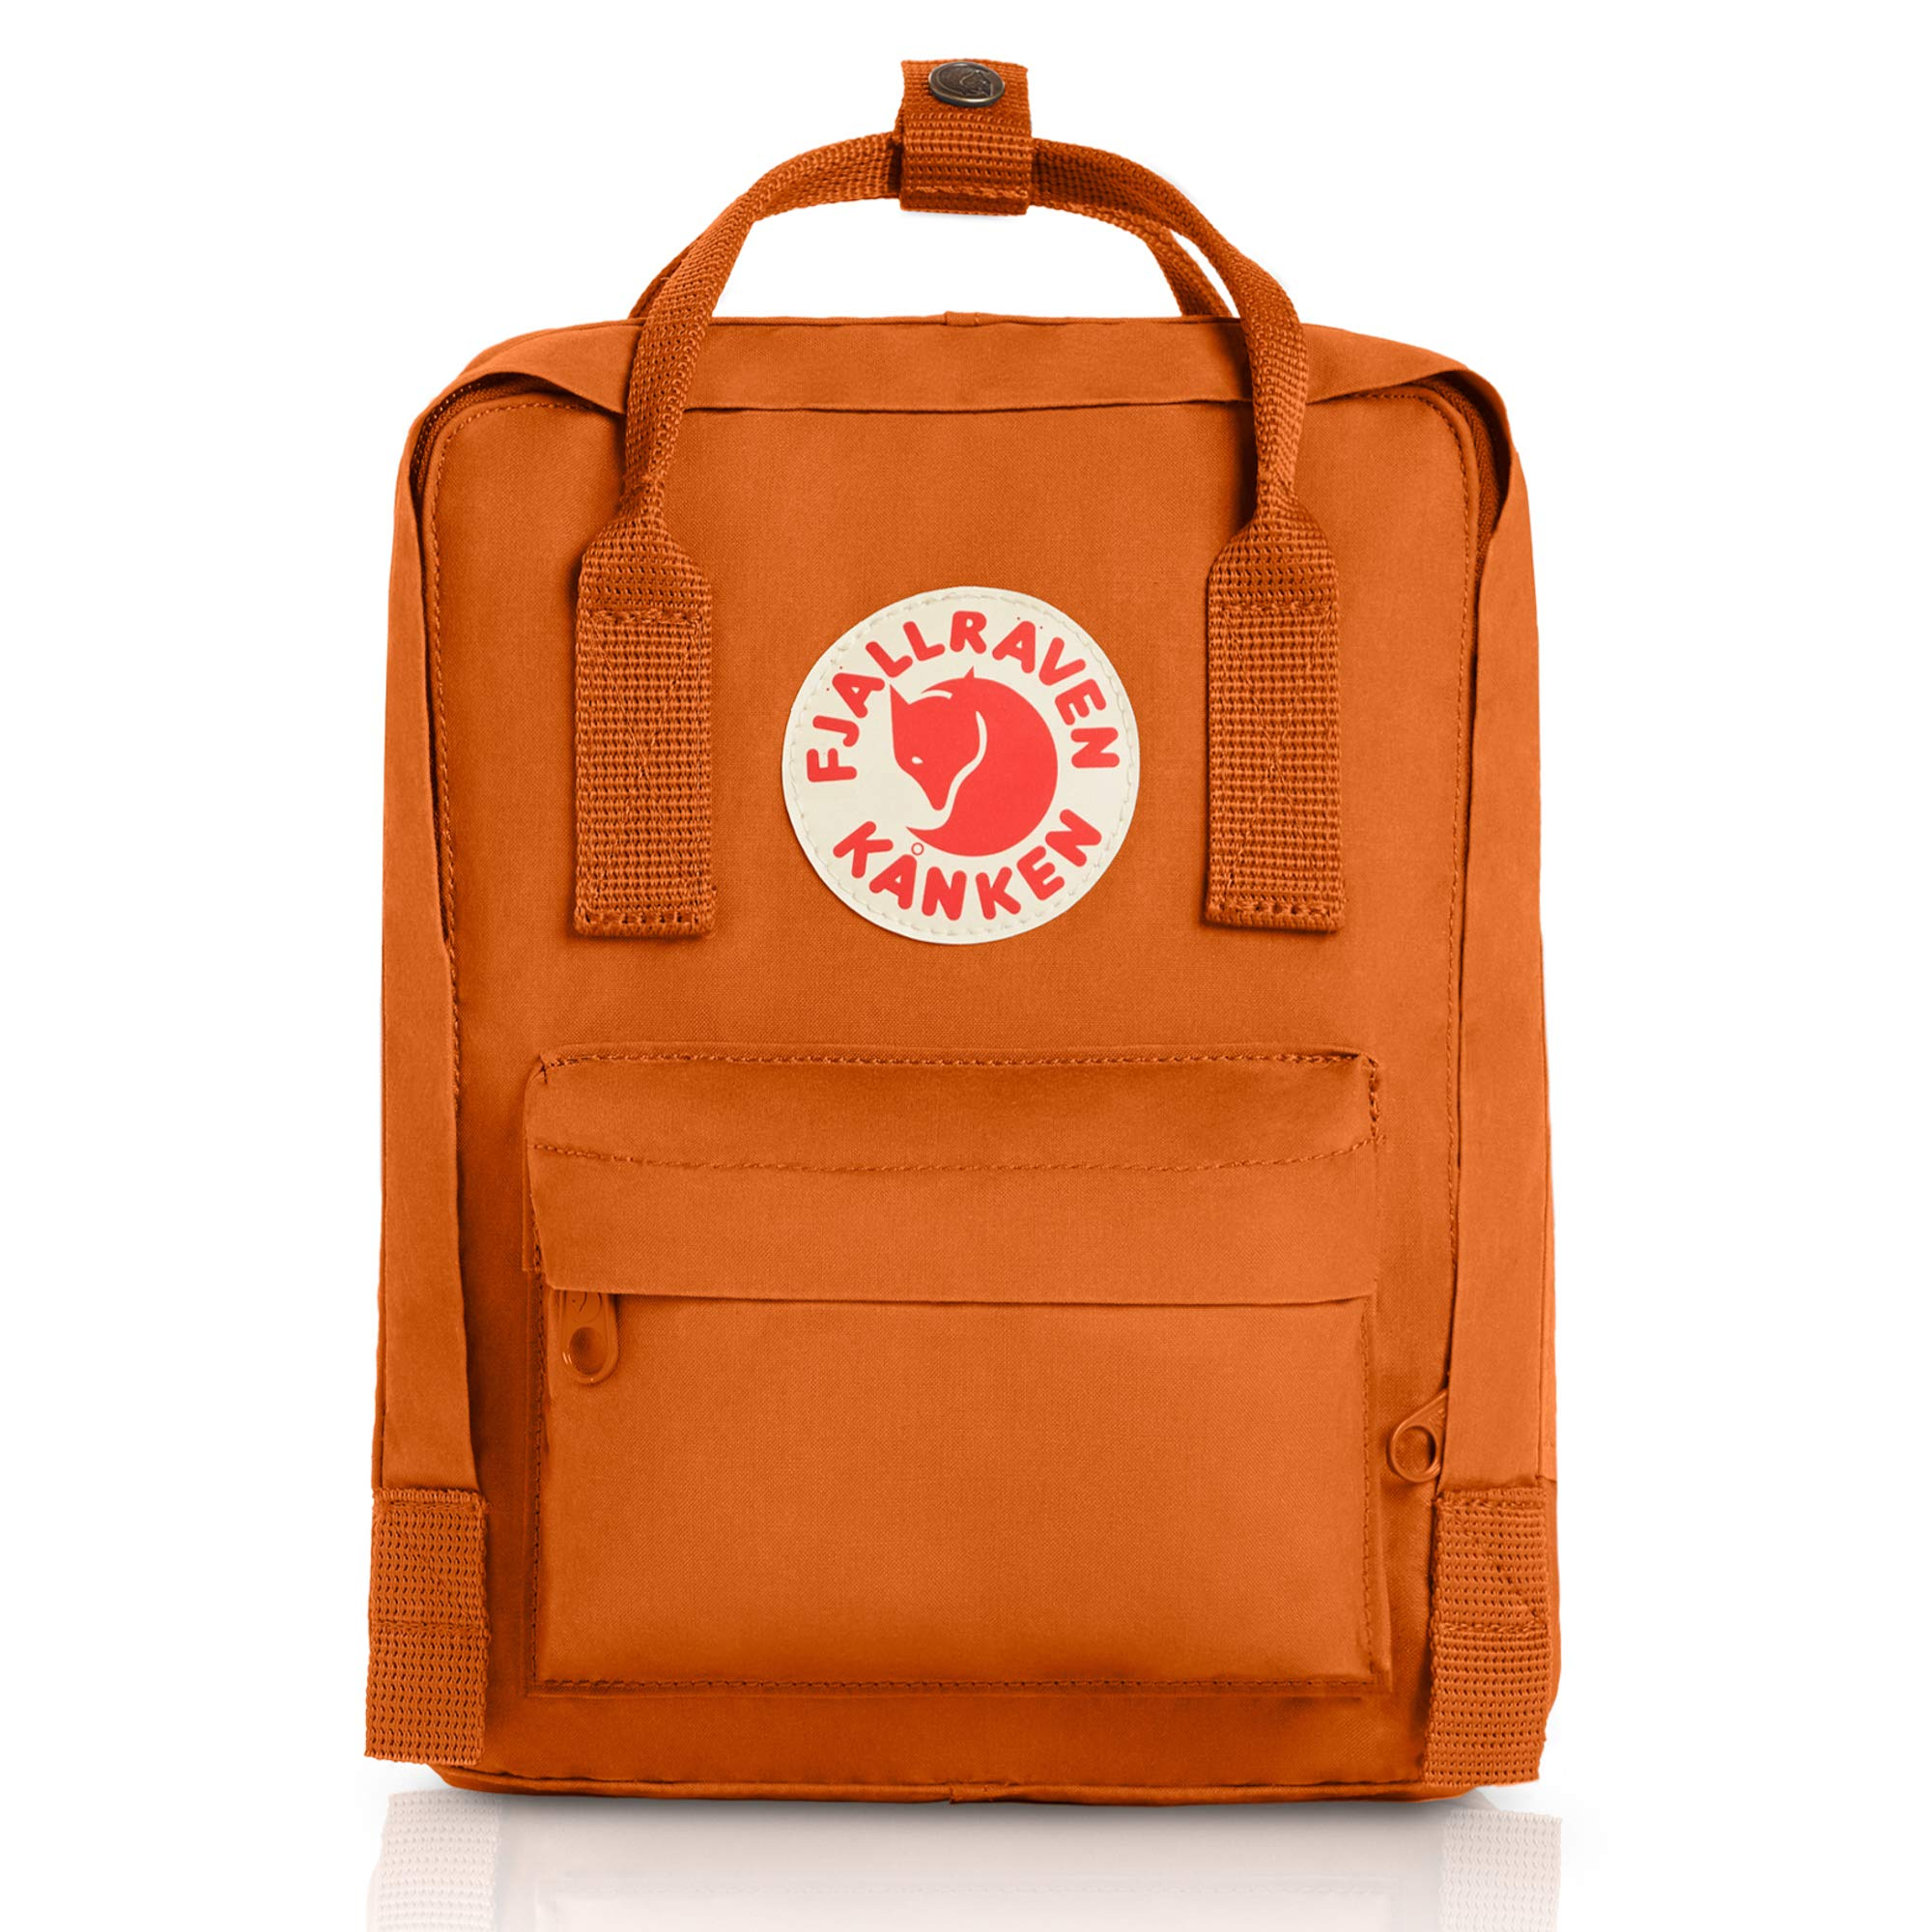 2df8dfcd24 Fjallraven Kanken Mini Backpack - Brick - 23561   Casual Daypacks ...